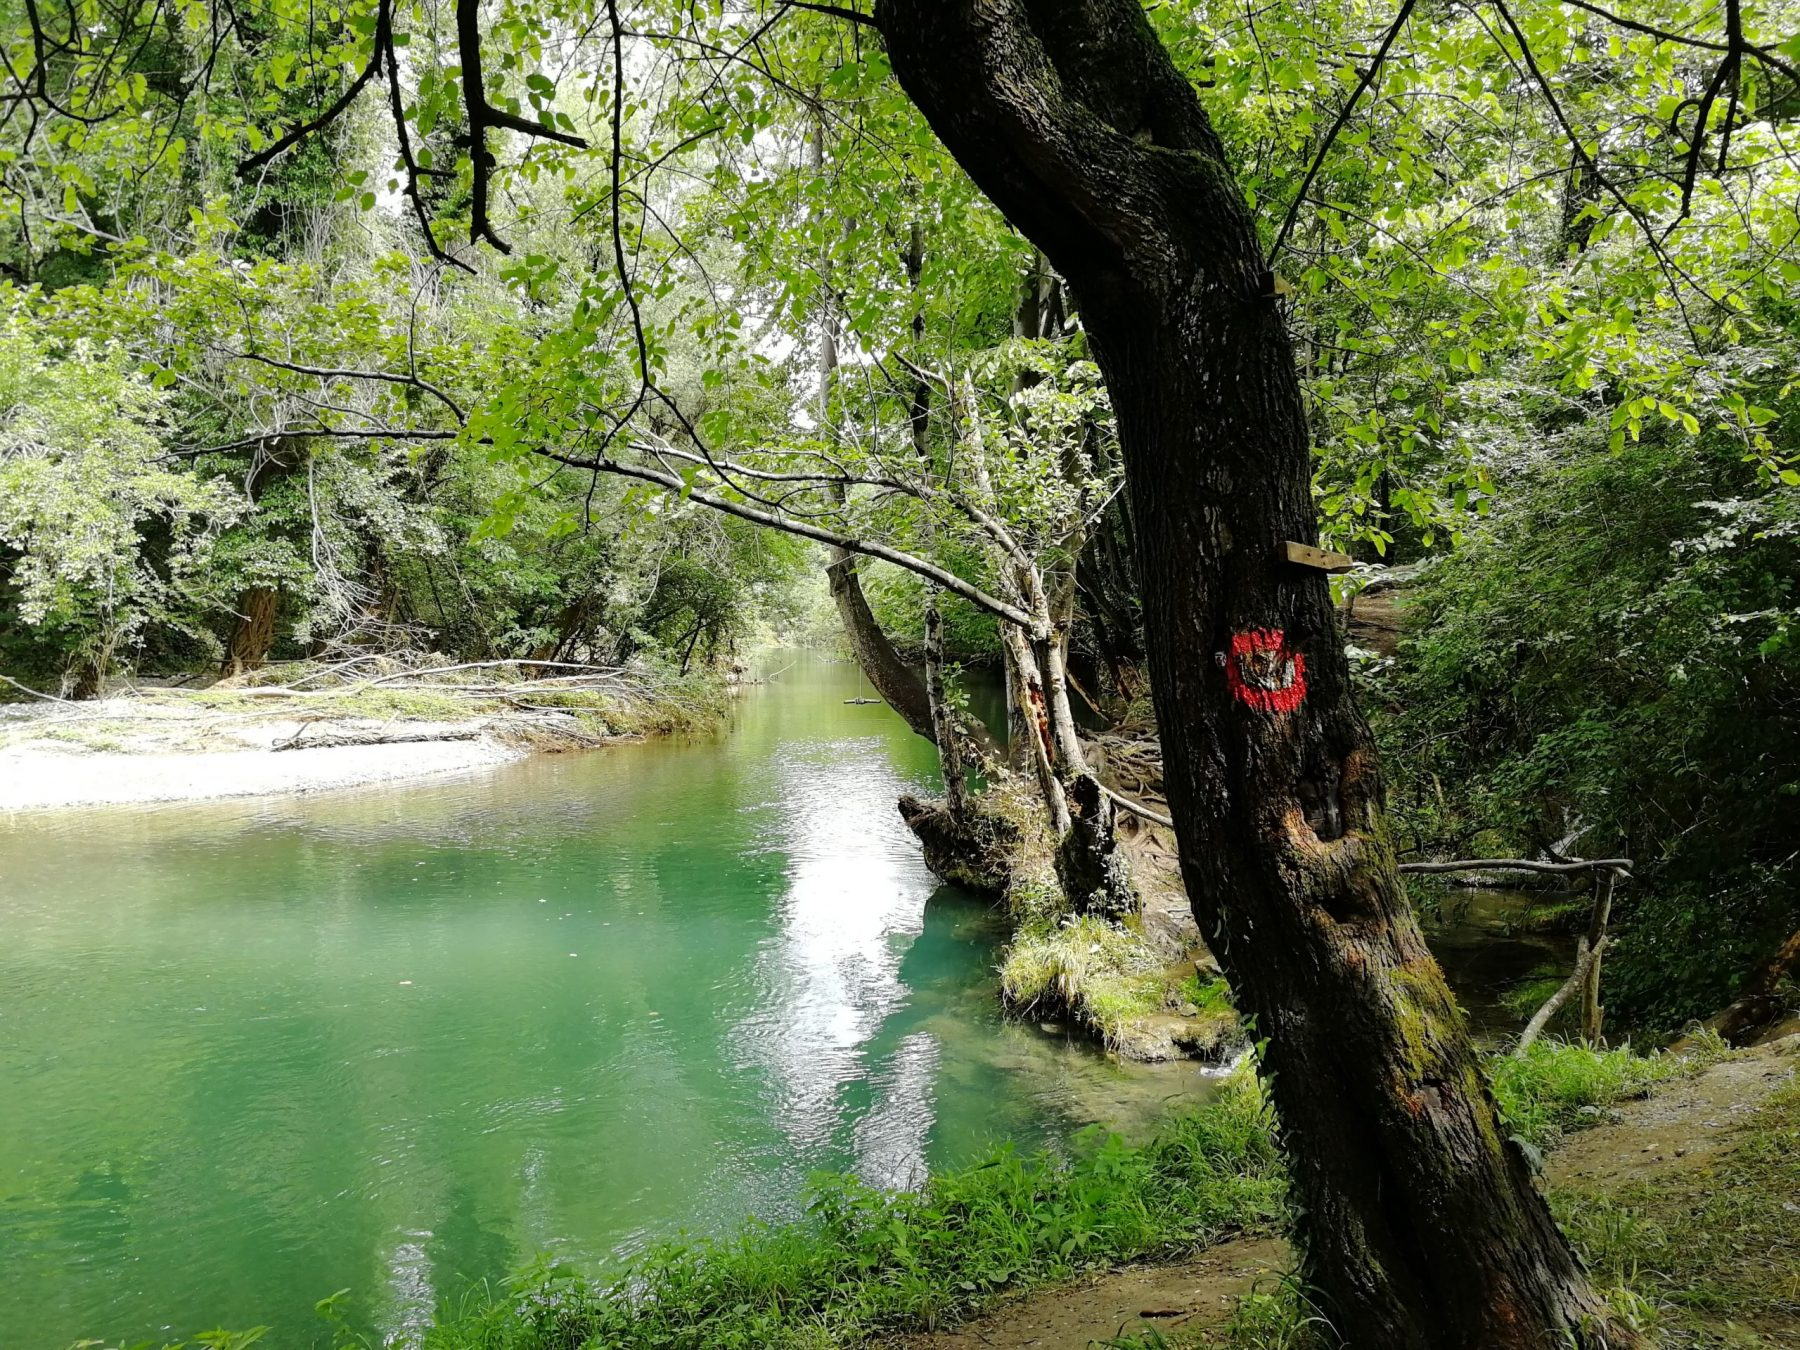 Ribnica i klisura reke Gradac